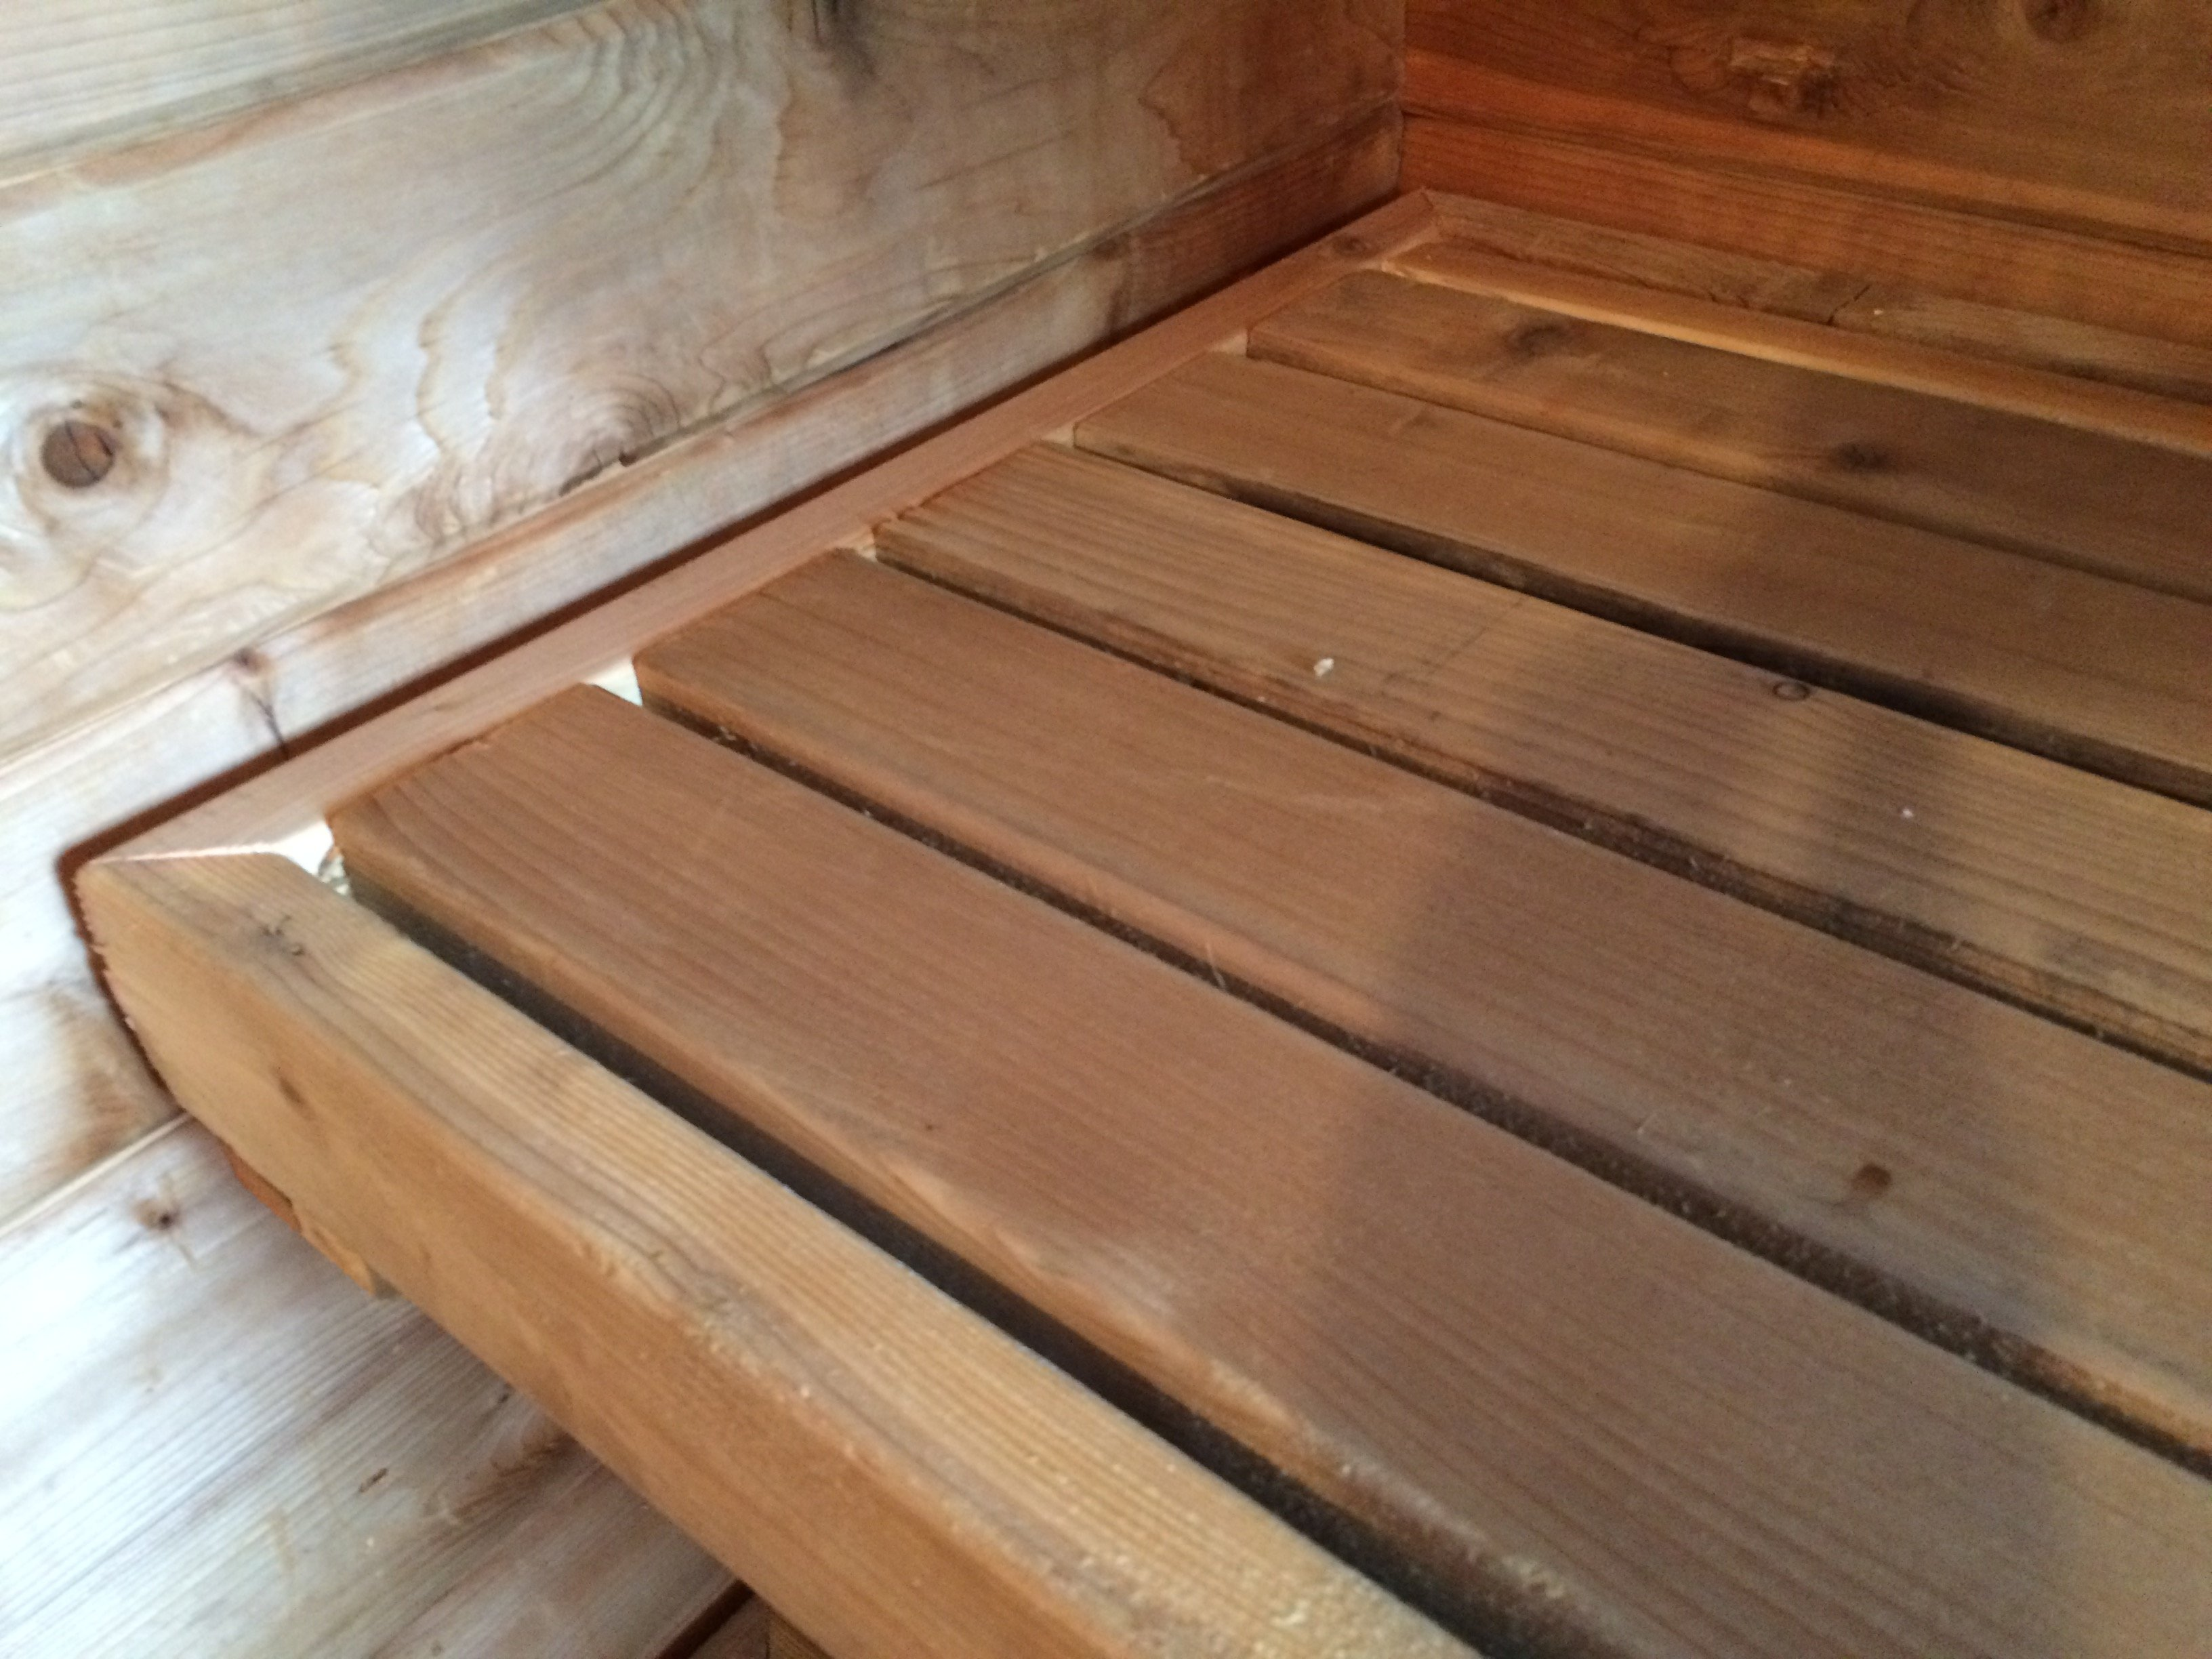 2x4 cedar makes for ideal sauna benches